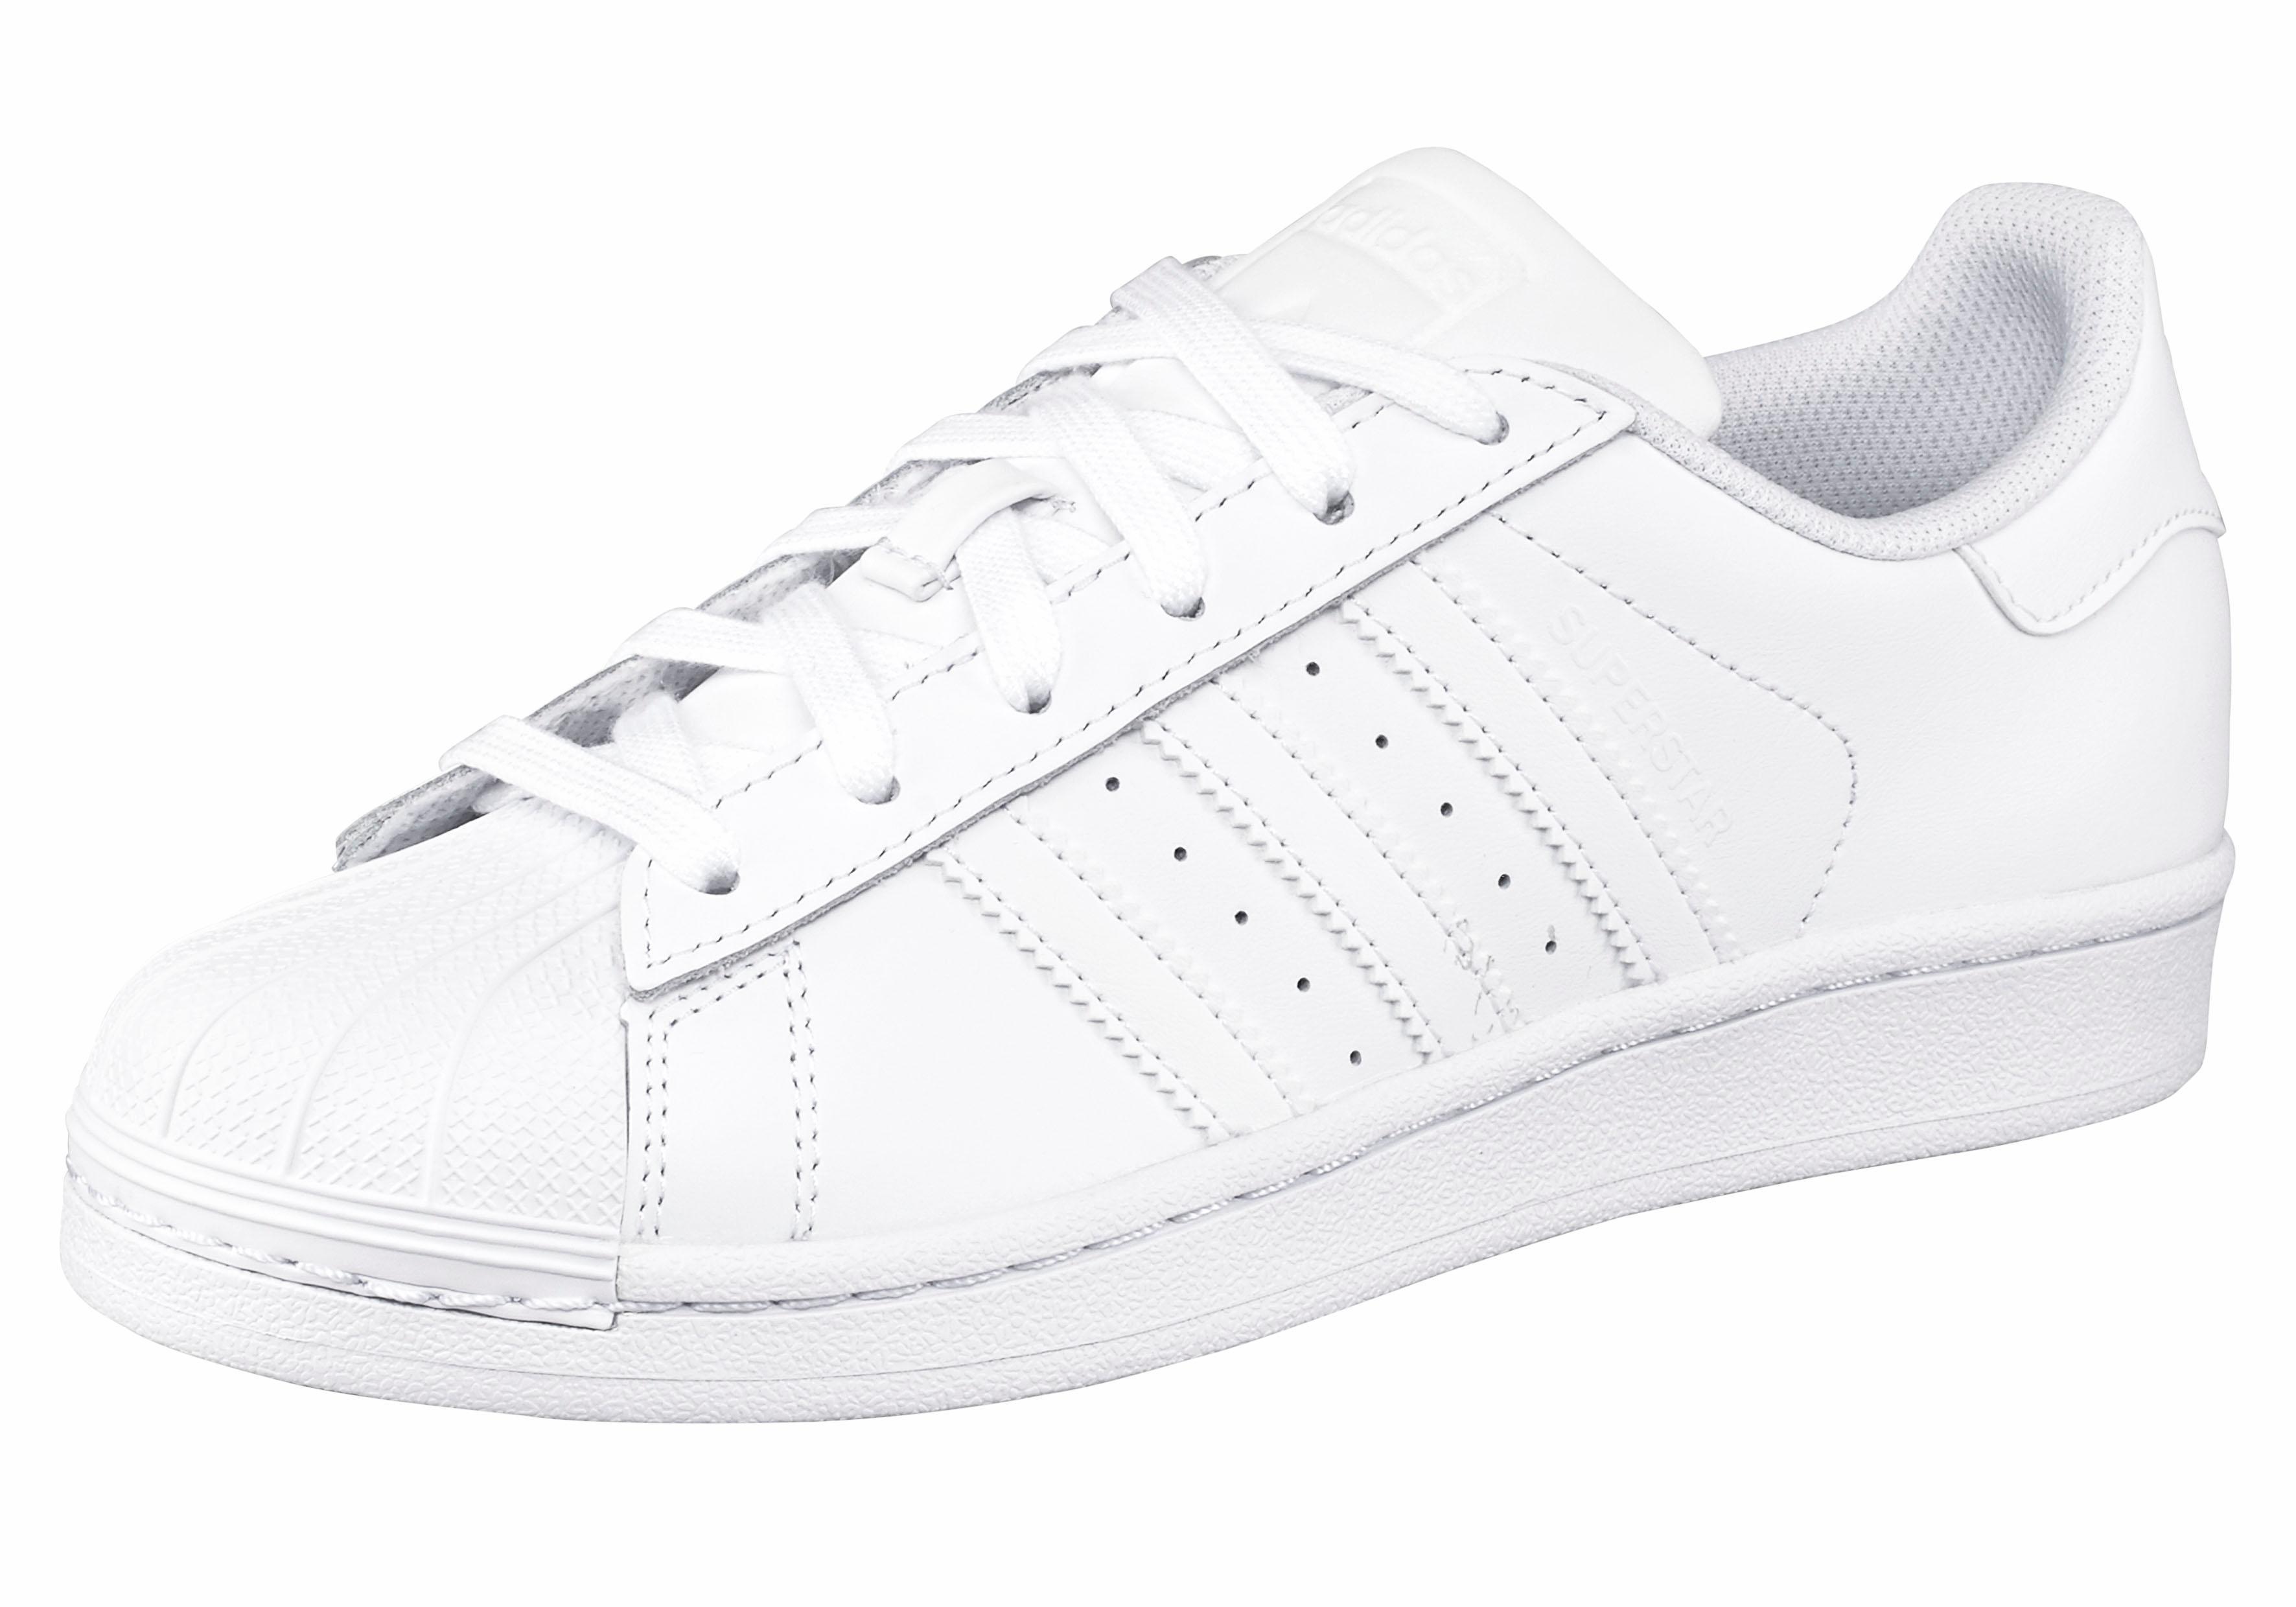 675a82a12cc ... adidas Originals sneakers »Superstar W 1«, adidas Originals sneakers »Superstar  W 1«, adidas Originals sneakers »Superstar W 1«, adidas Originals ...